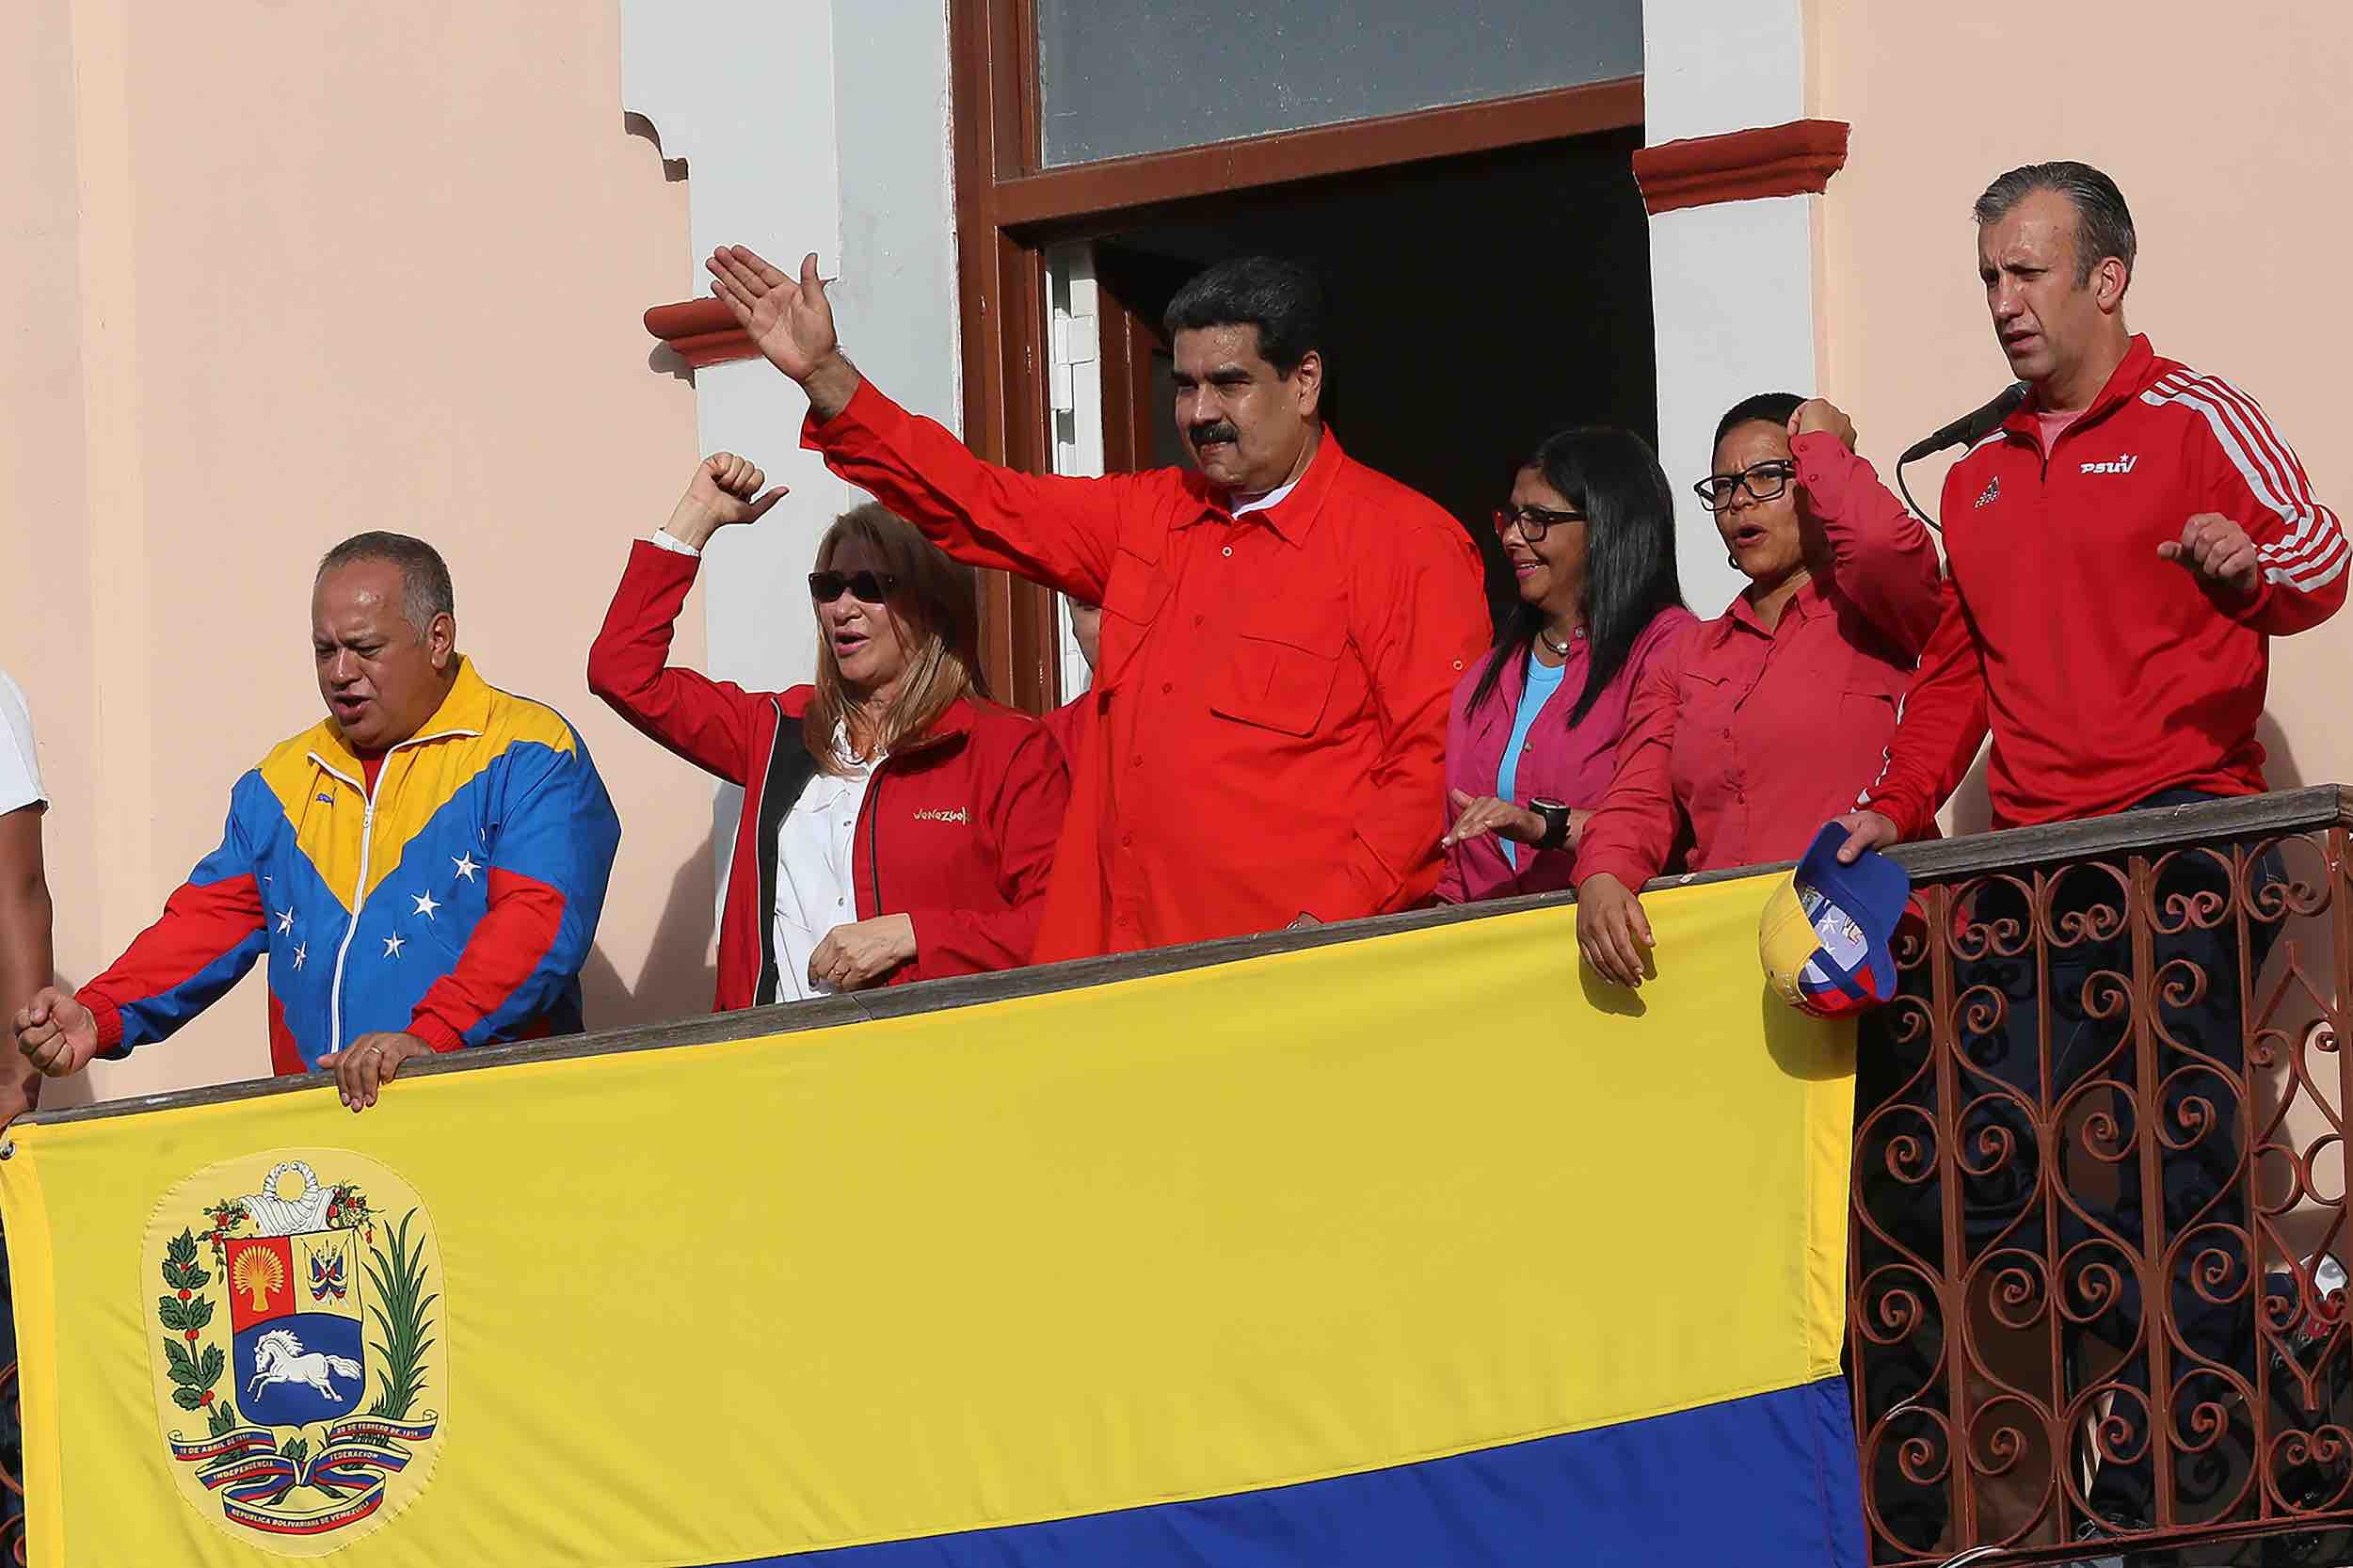 Here's What's Unfolding in Venezuela Since Juan Guaidó Declared Himself President